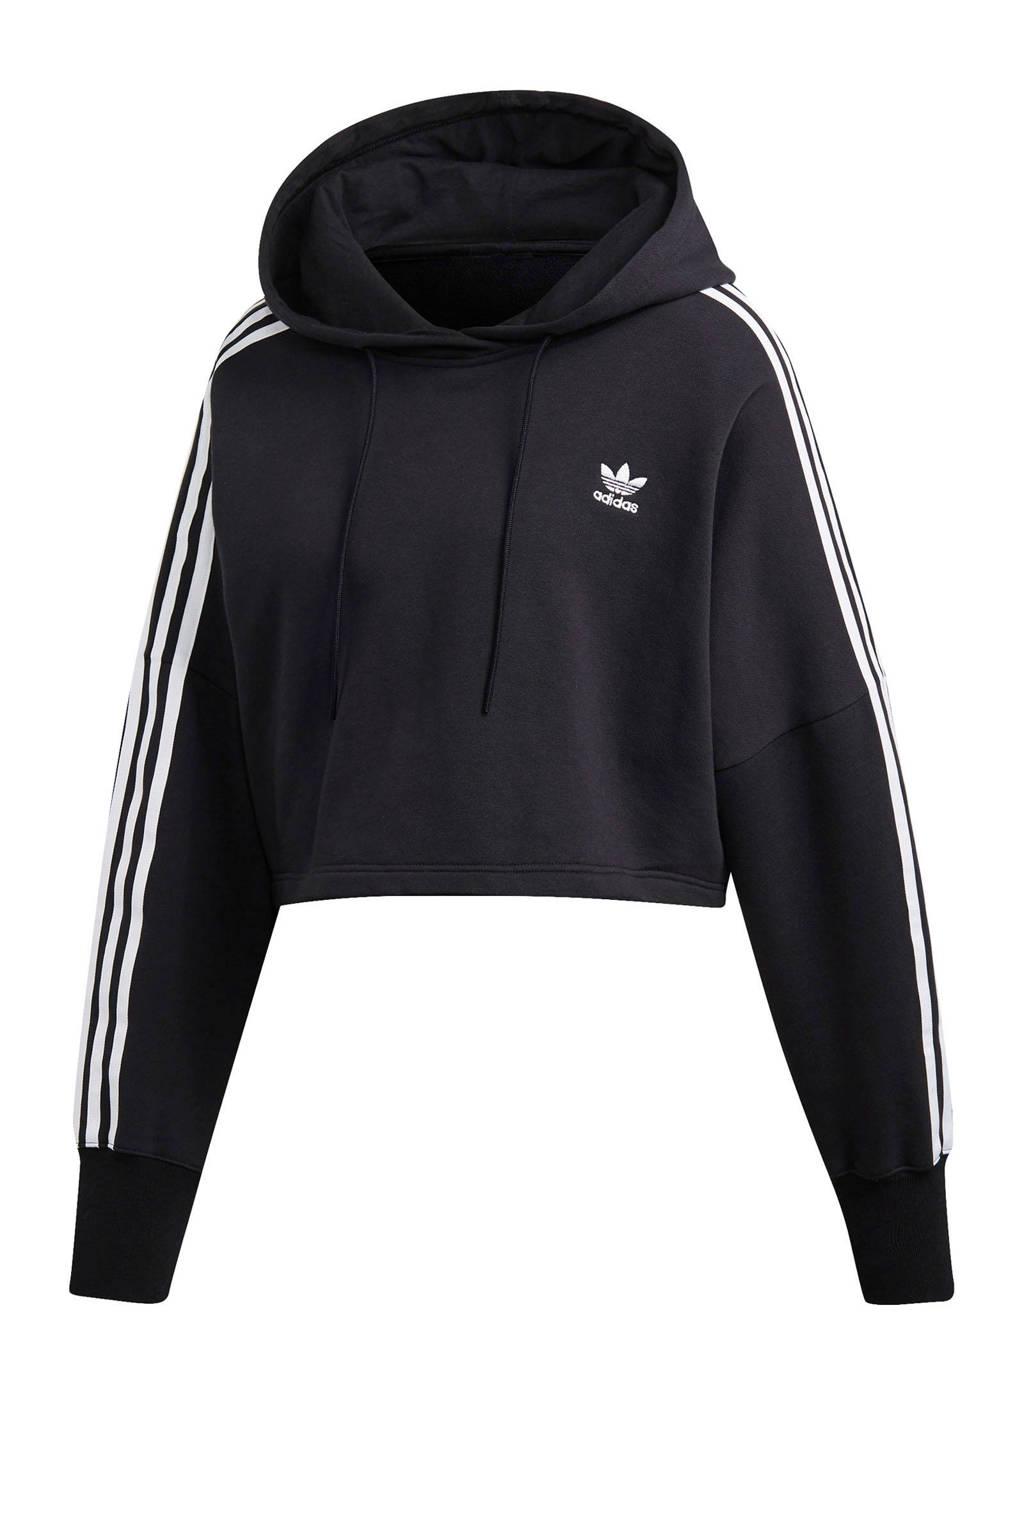 adidas Originals Adicolor cropped sweater zwart/wit, Zwart/wit